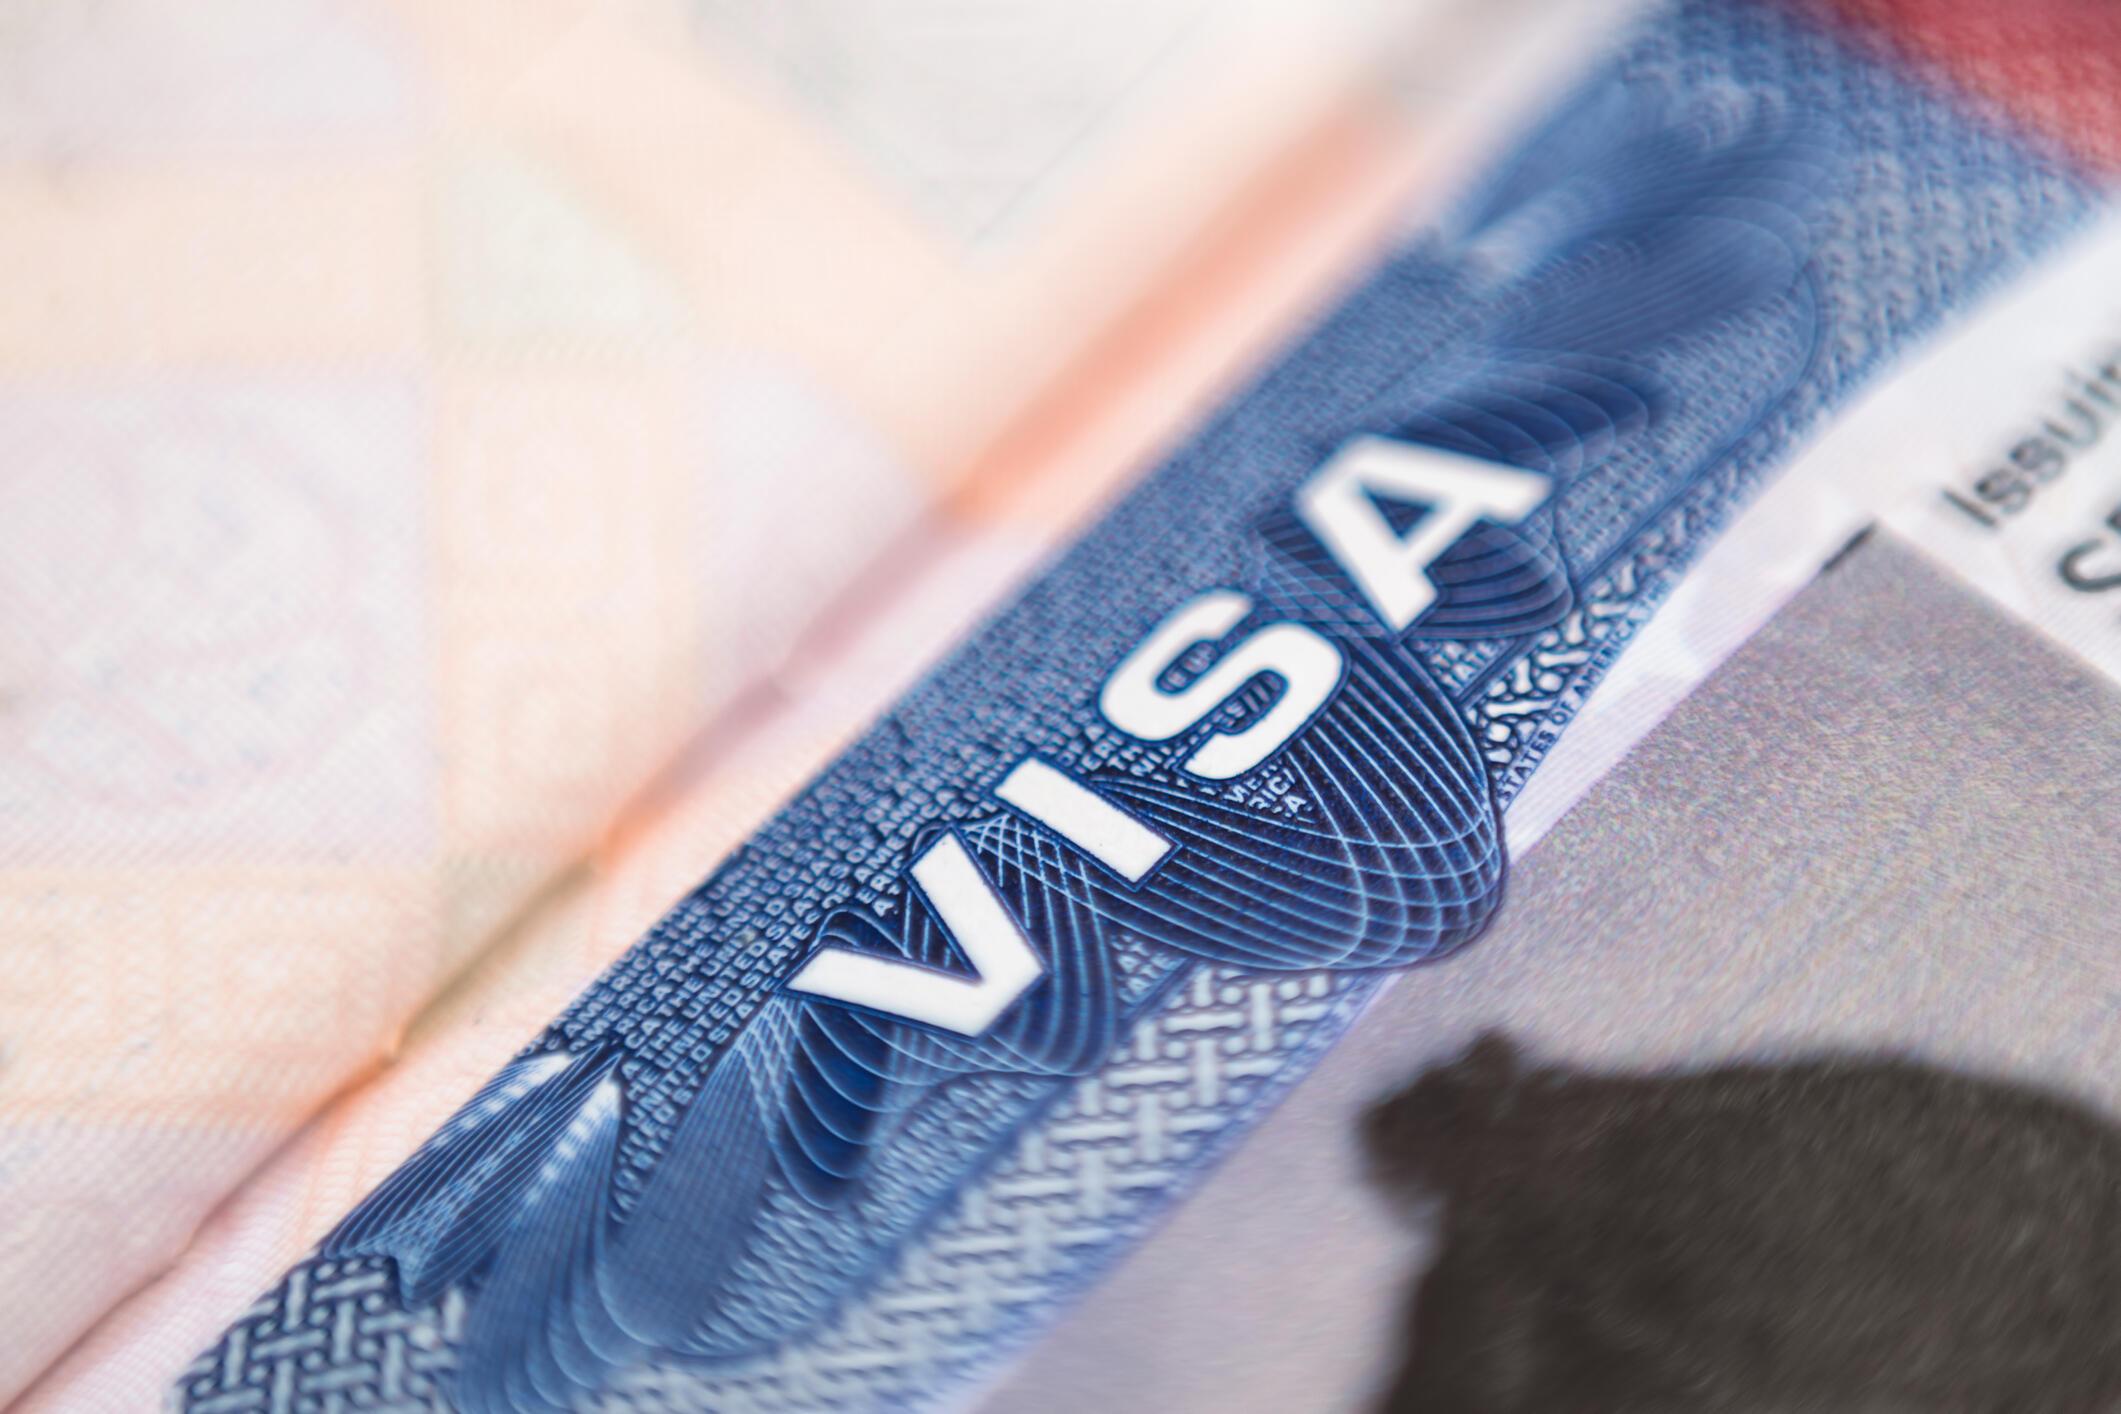 Passeport - Visa - Label - Immigration GettyImages-1266429167